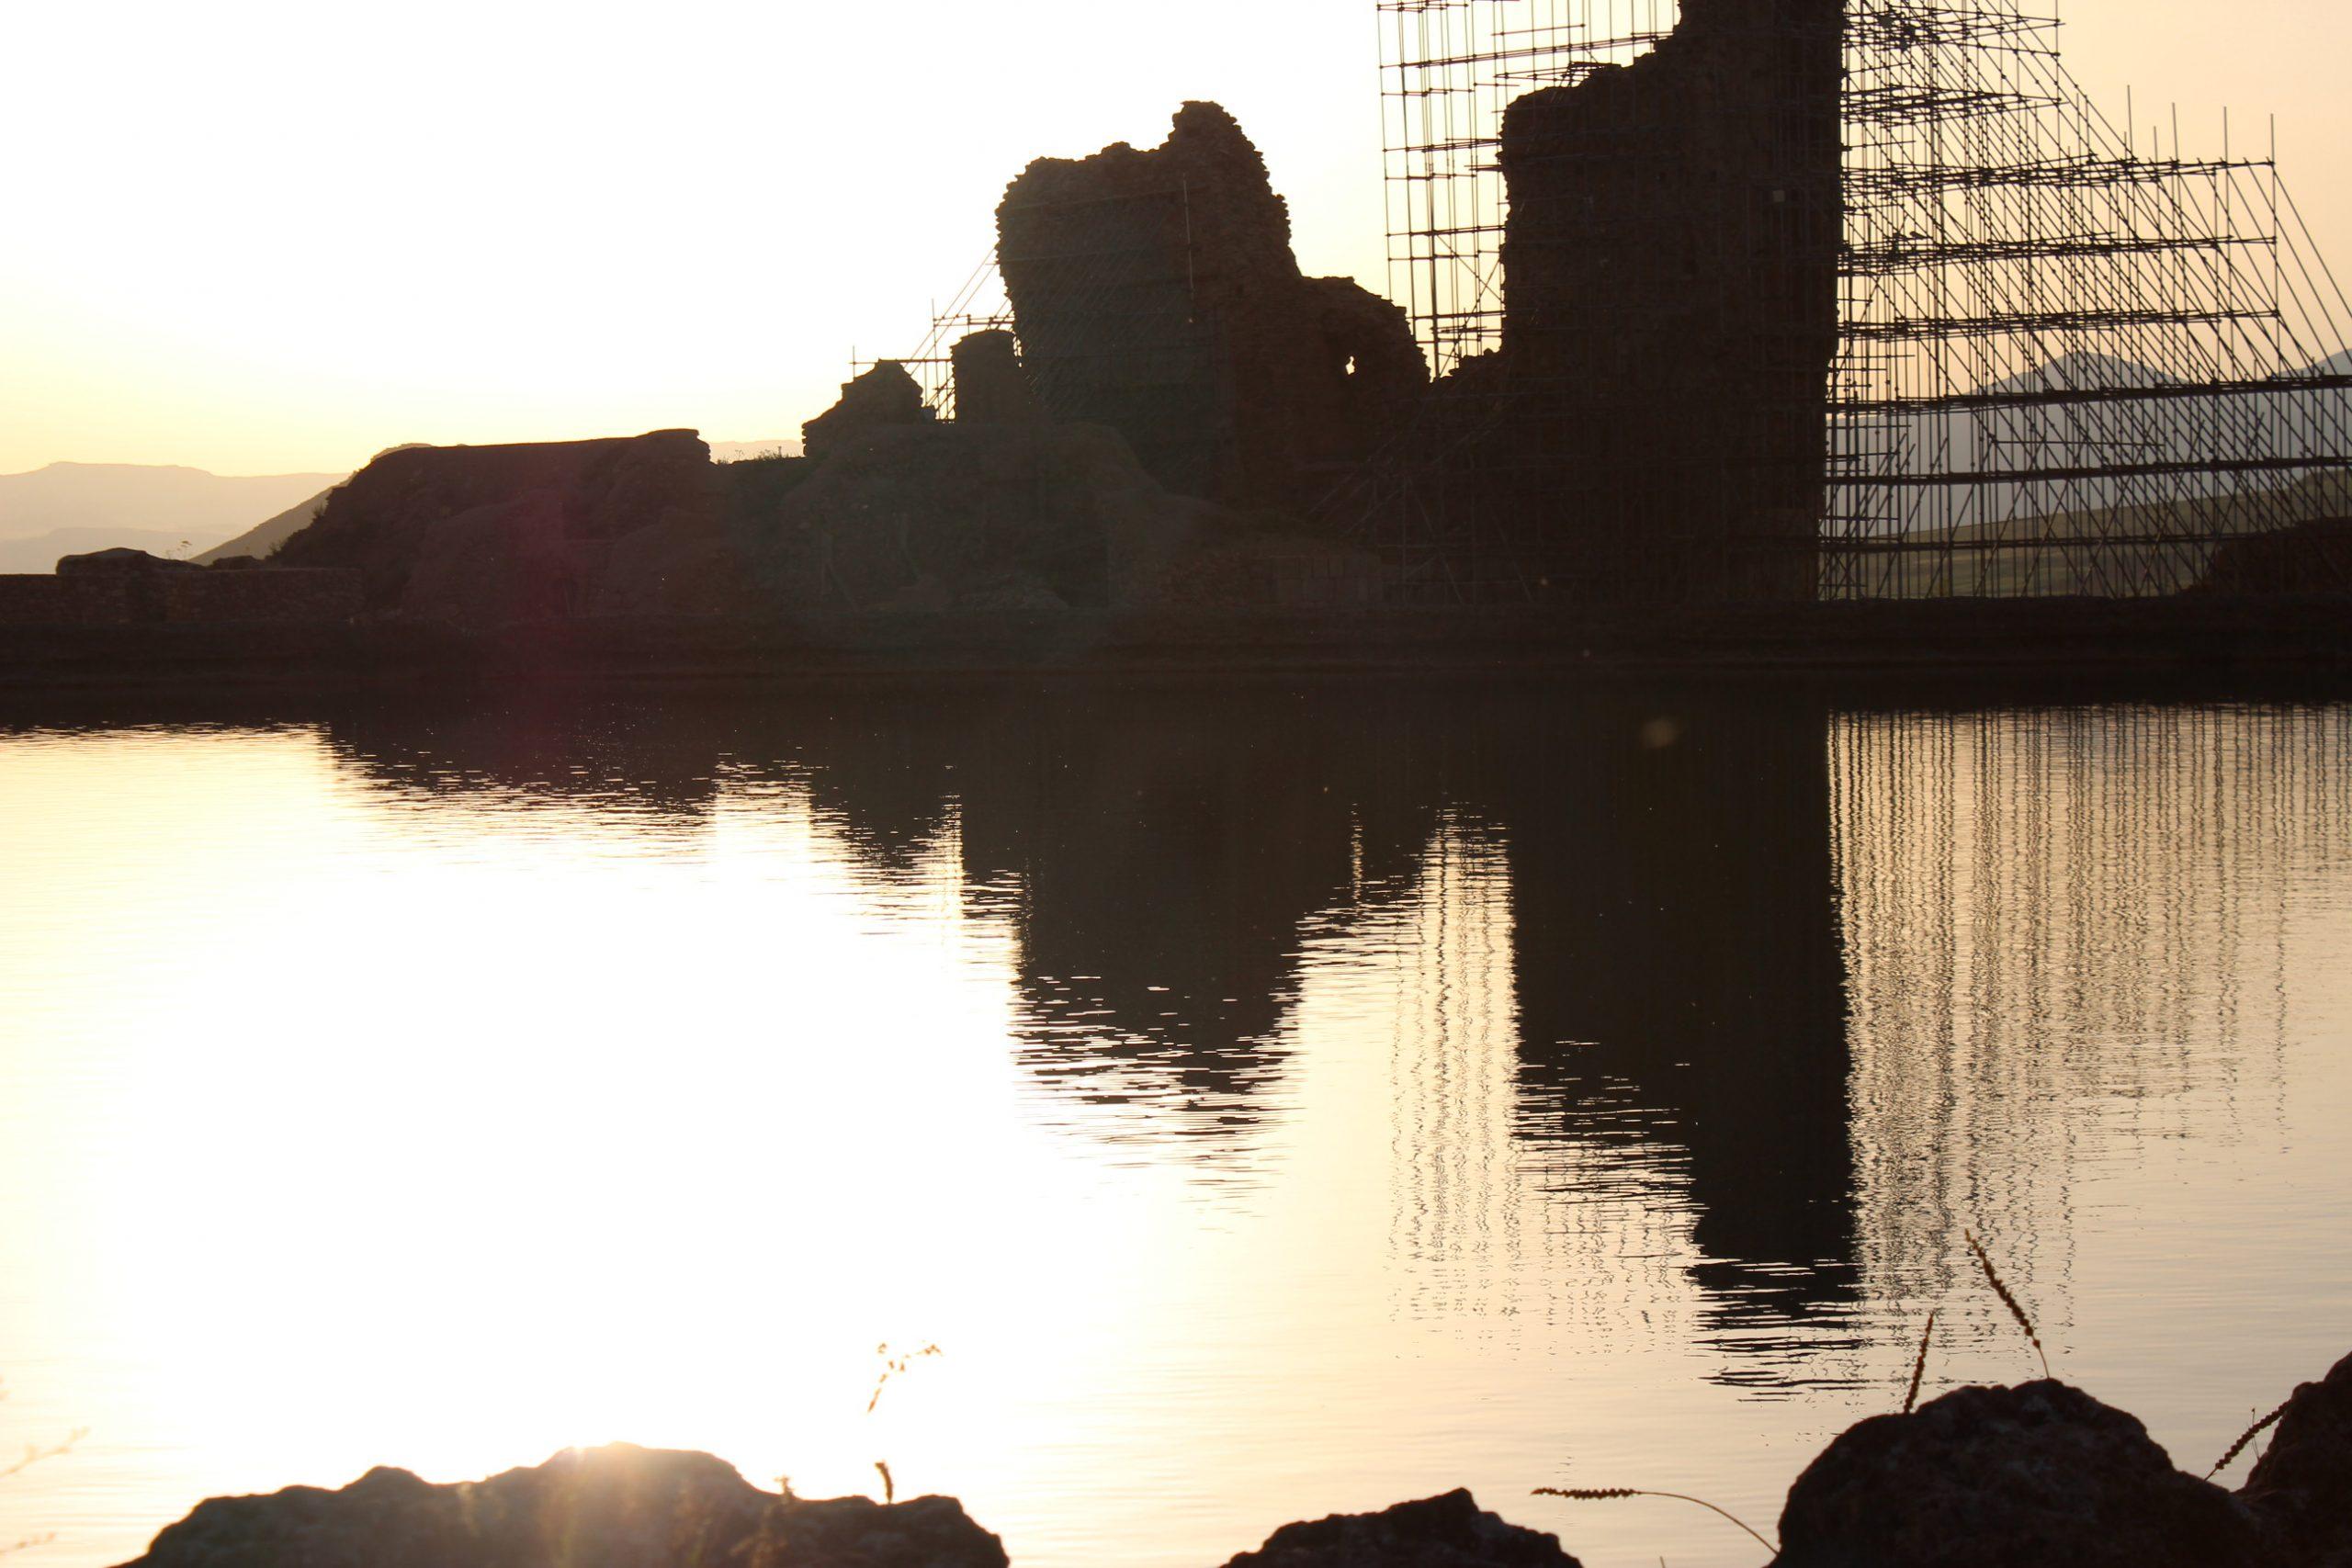 دریاچهی آتشکده آذرگشسپ